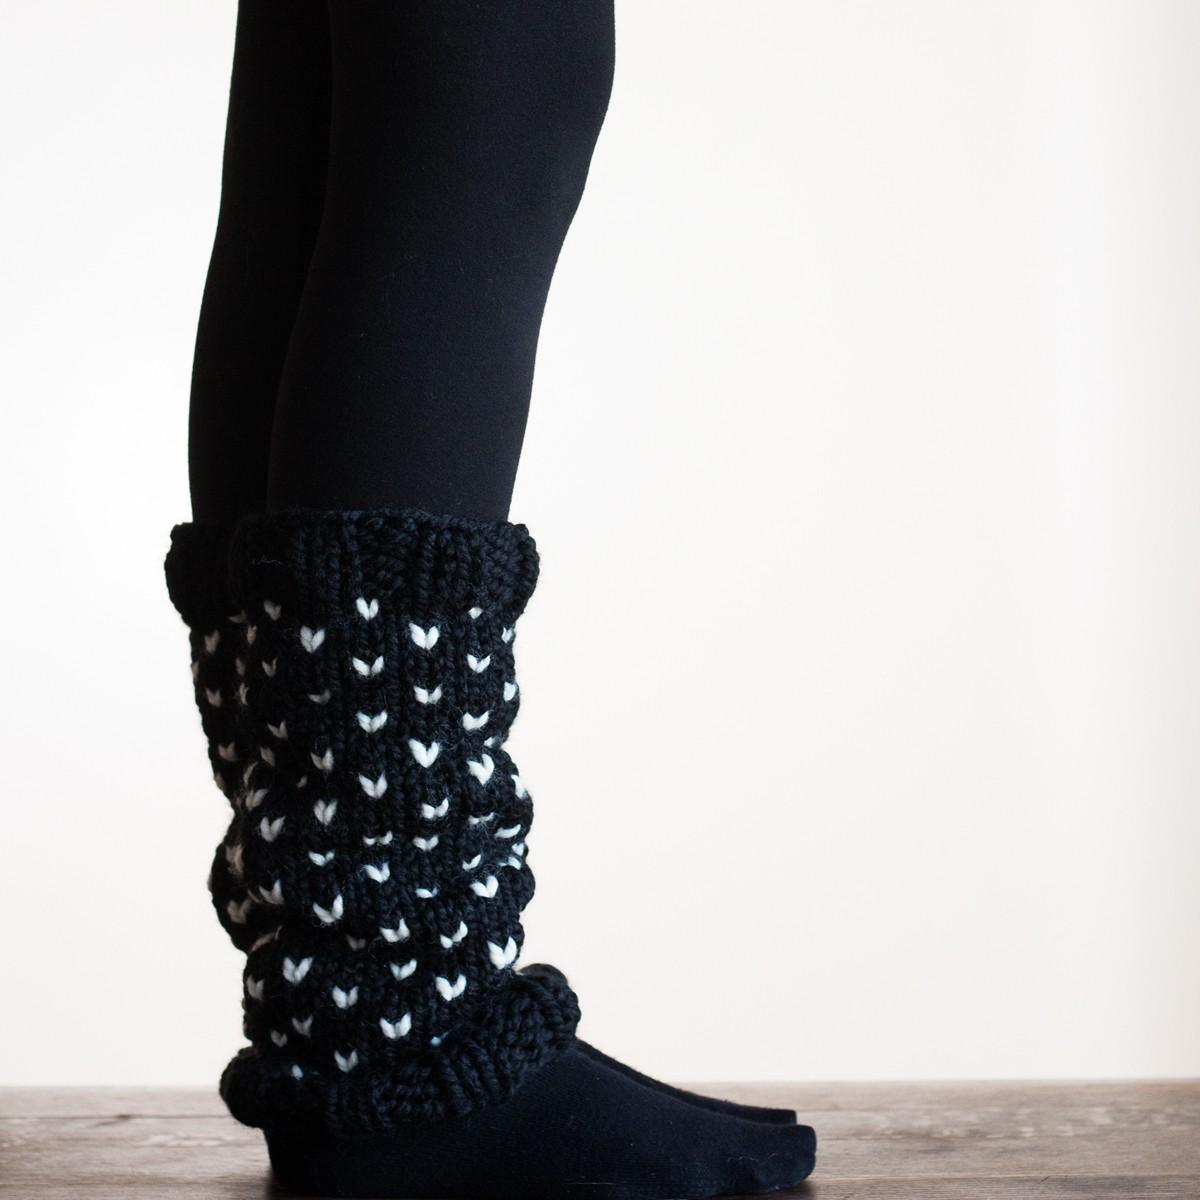 STEADFAST : Leg Warmer Knitting Pattern - Brome Fields